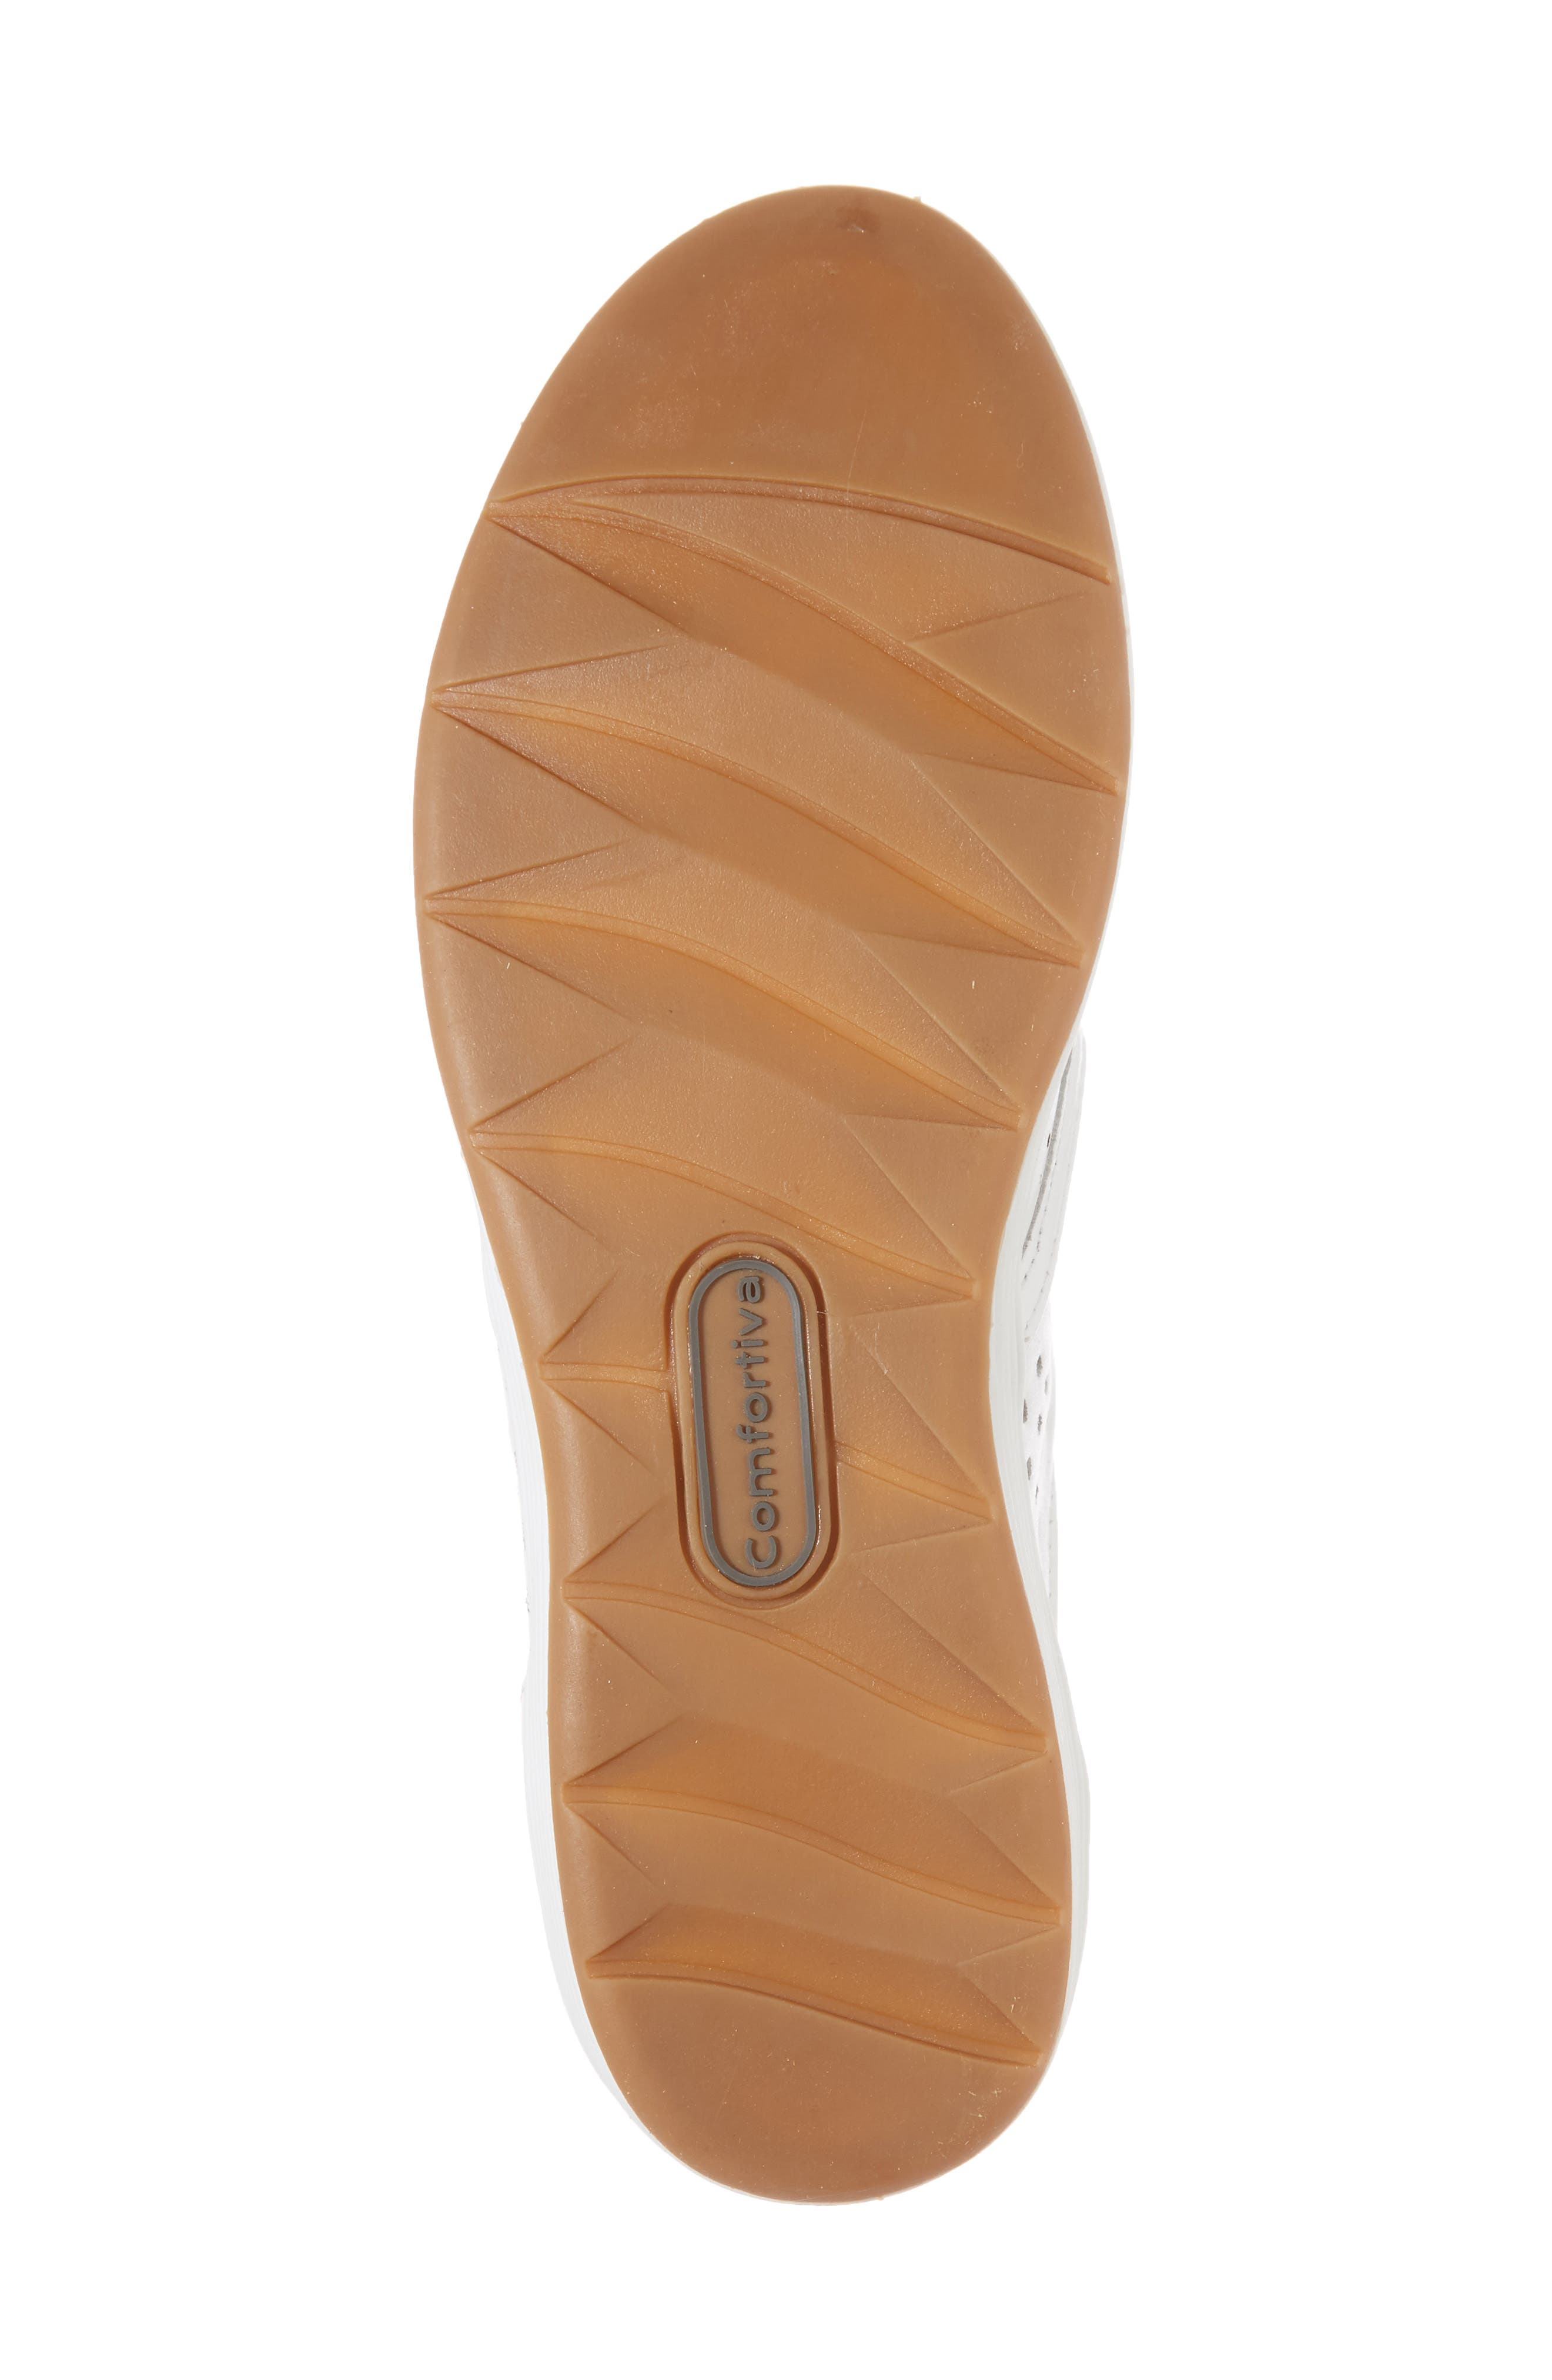 Lyra Perforated Slip-On Sneaker,                             Alternate thumbnail 6, color,                             White Leather